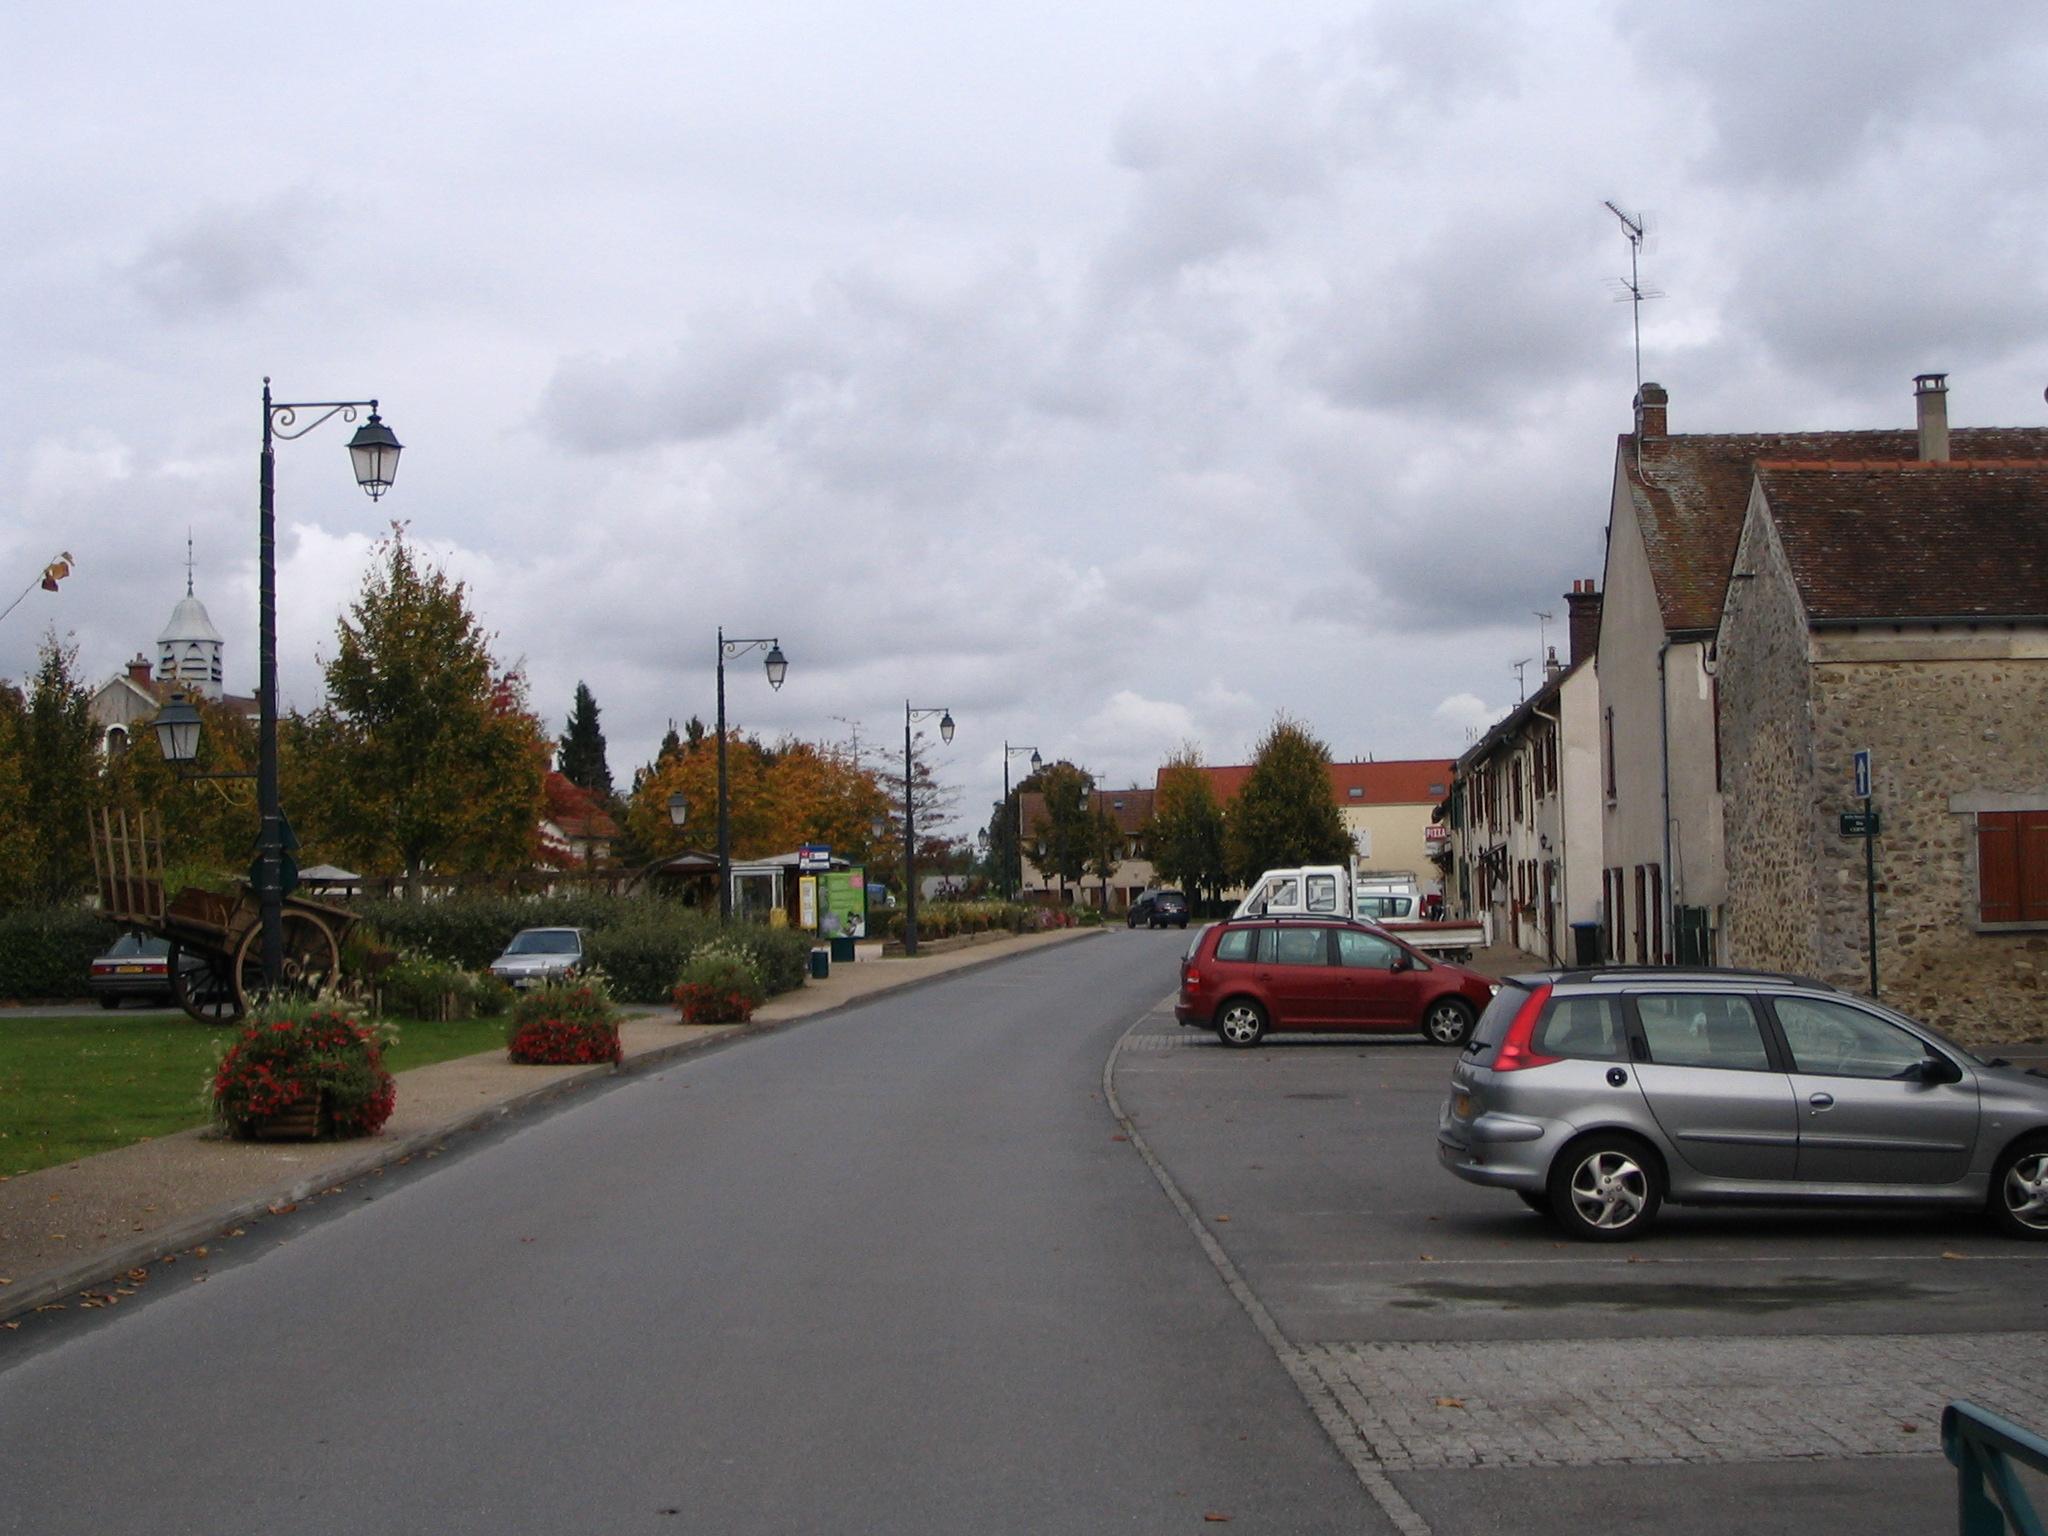 Bailly-Romainvilliers — Wikipédia dedans Piscine Bailly Romainvillier